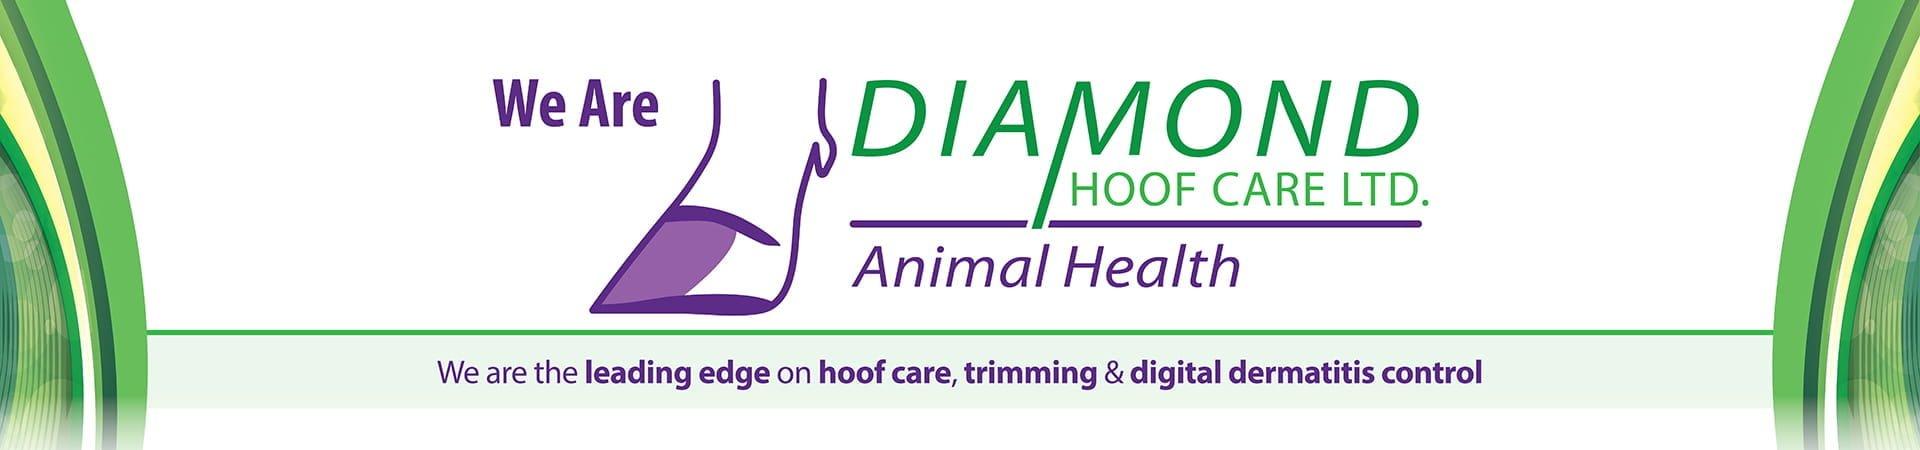 About Diamond Hoof Care